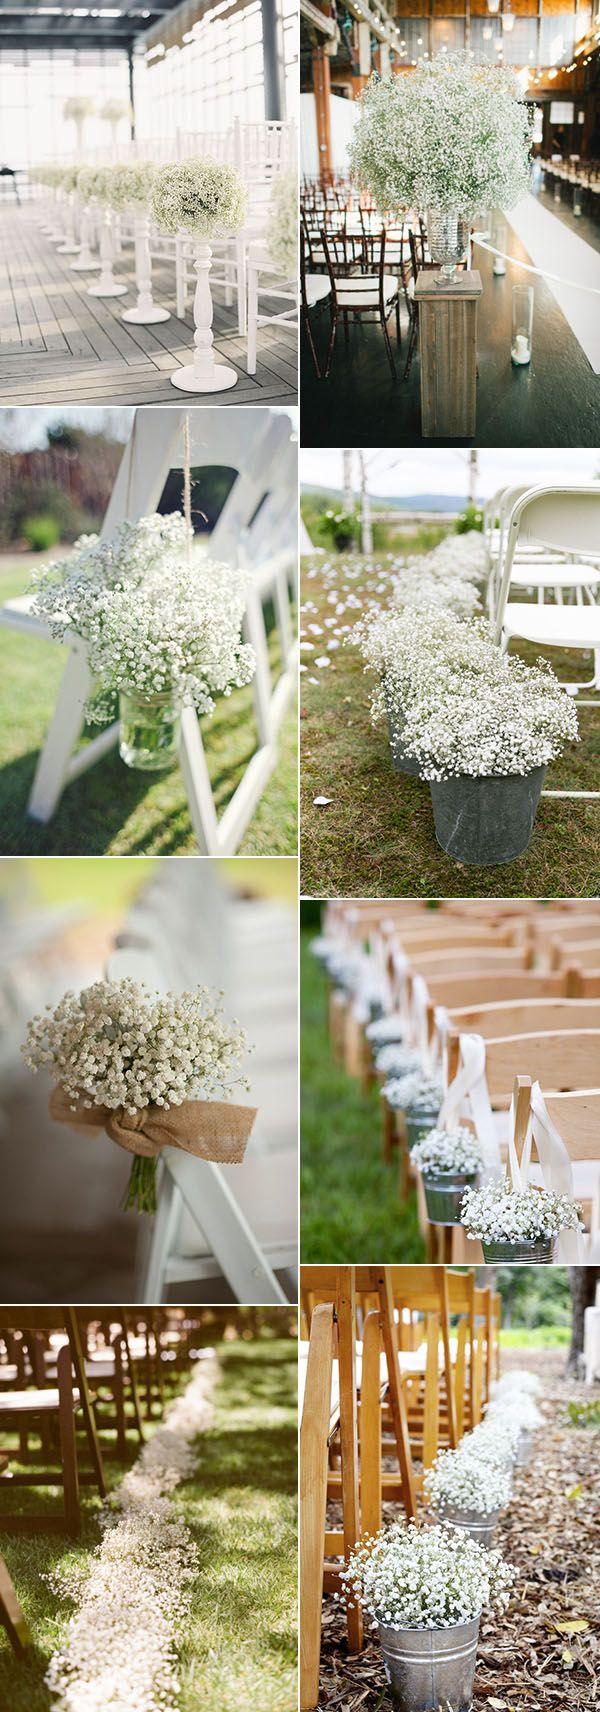 Wedding Flowers 40 Ideas To Use Baby S Breath Elegantweddinginvites Com Blog Wedding Decorations Wedding Centerpieces Wedding Ceremony Chairs